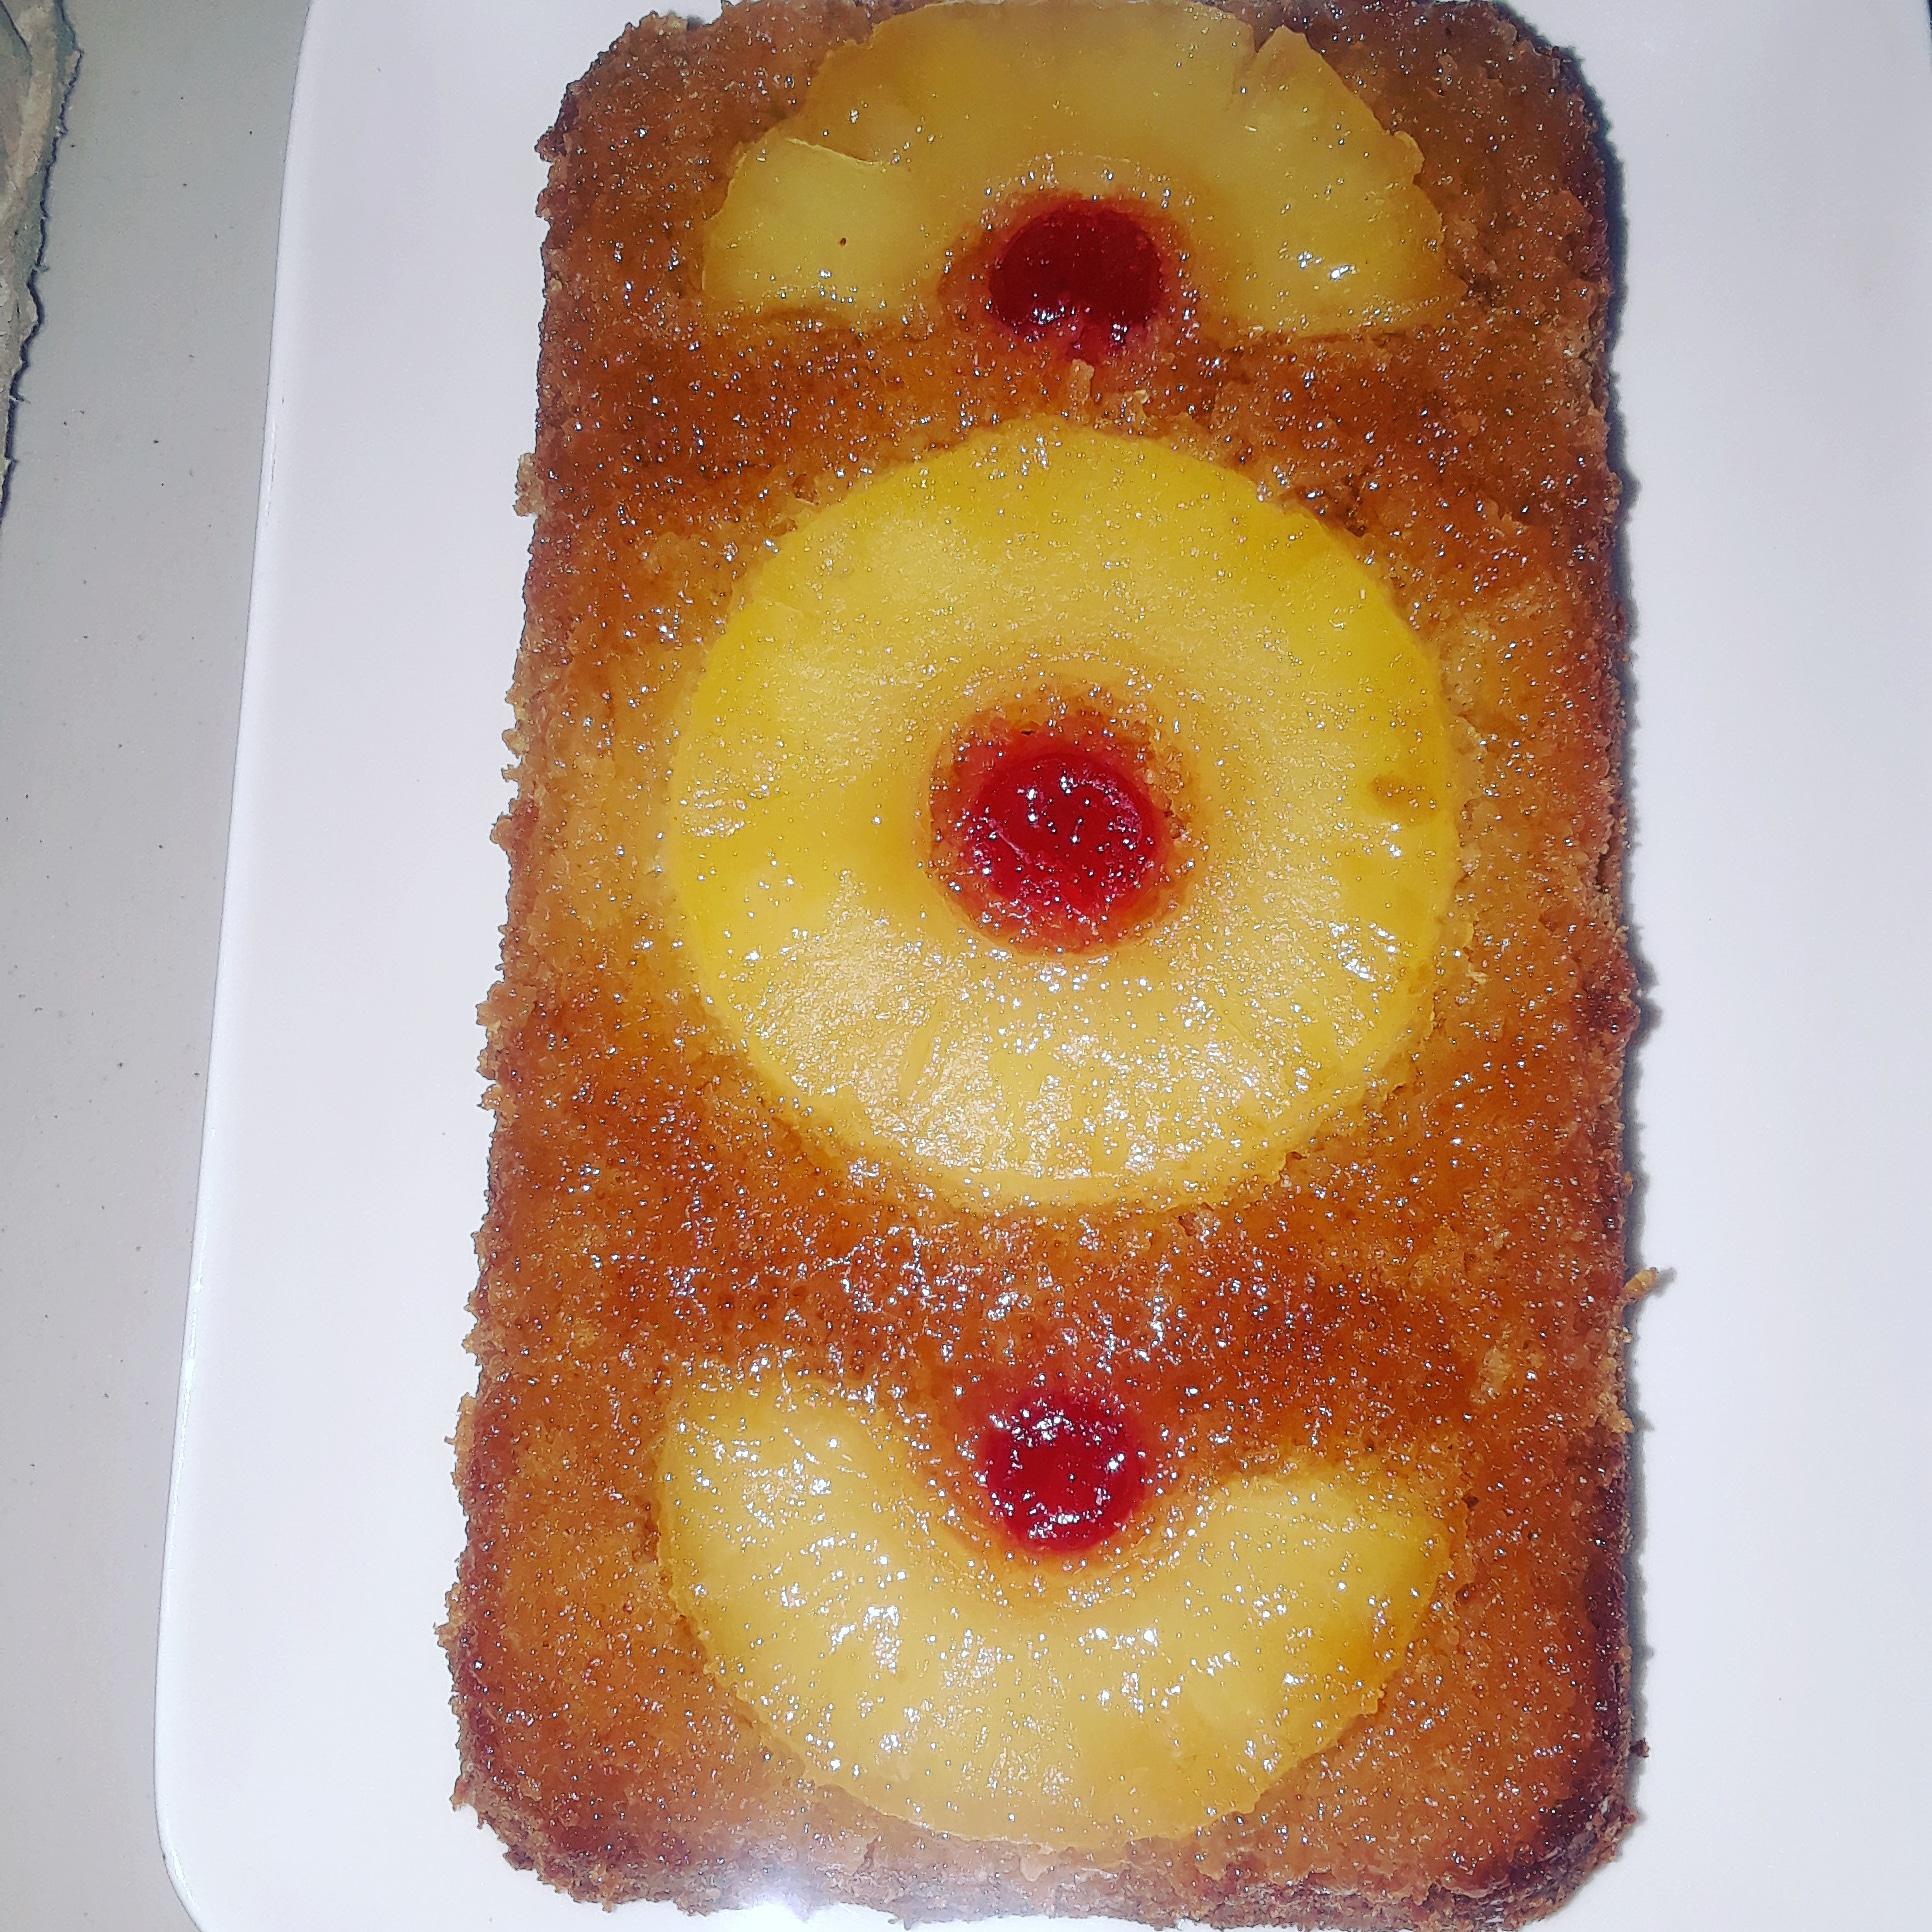 Gluten free pineapple upside down cassava cake.